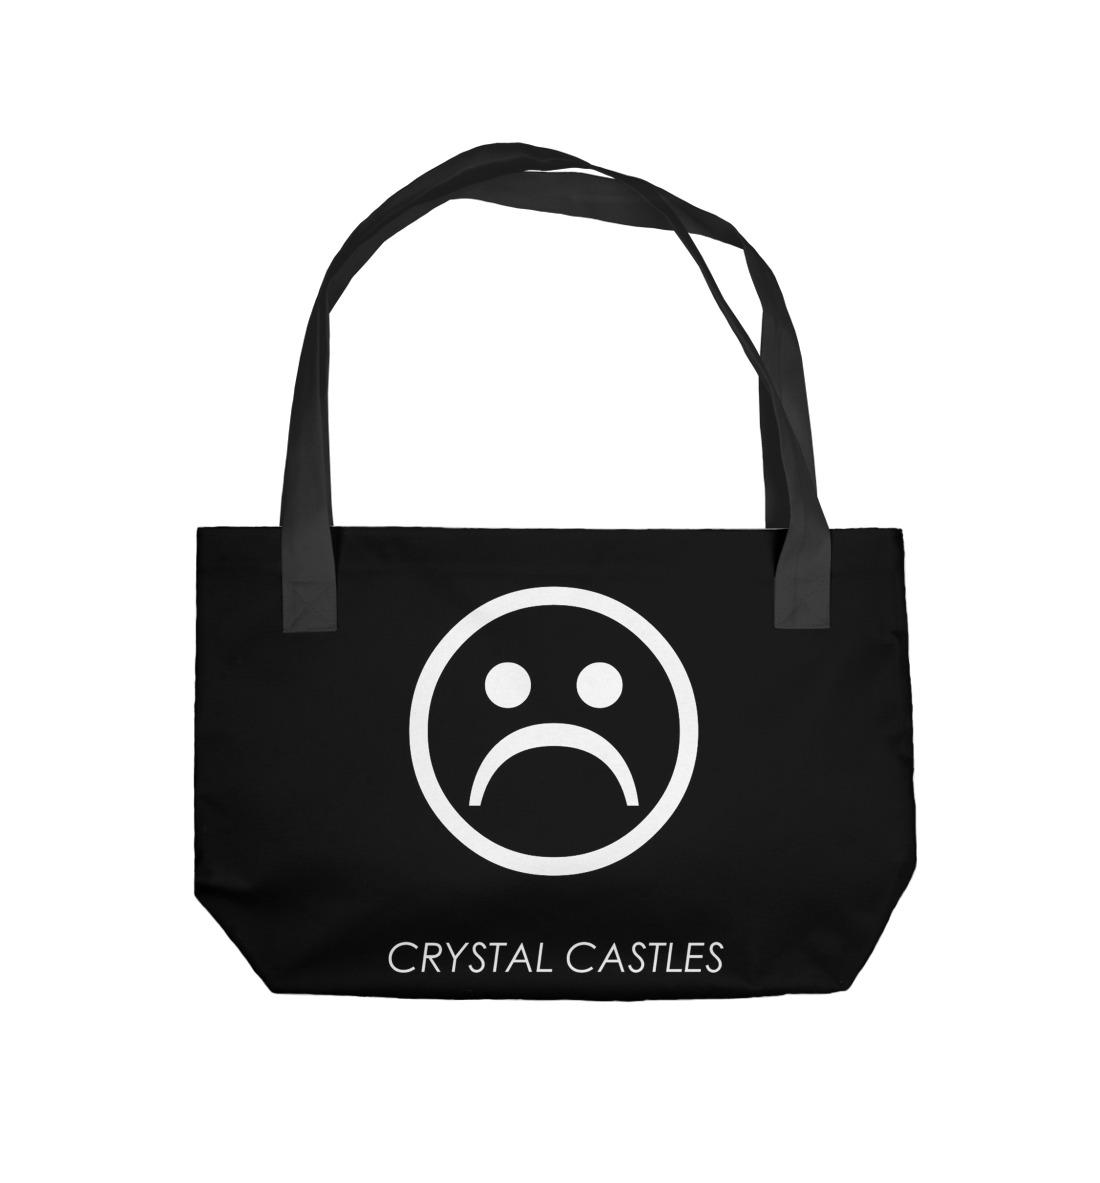 Фото - Crystal Castles cross crs at0395 3